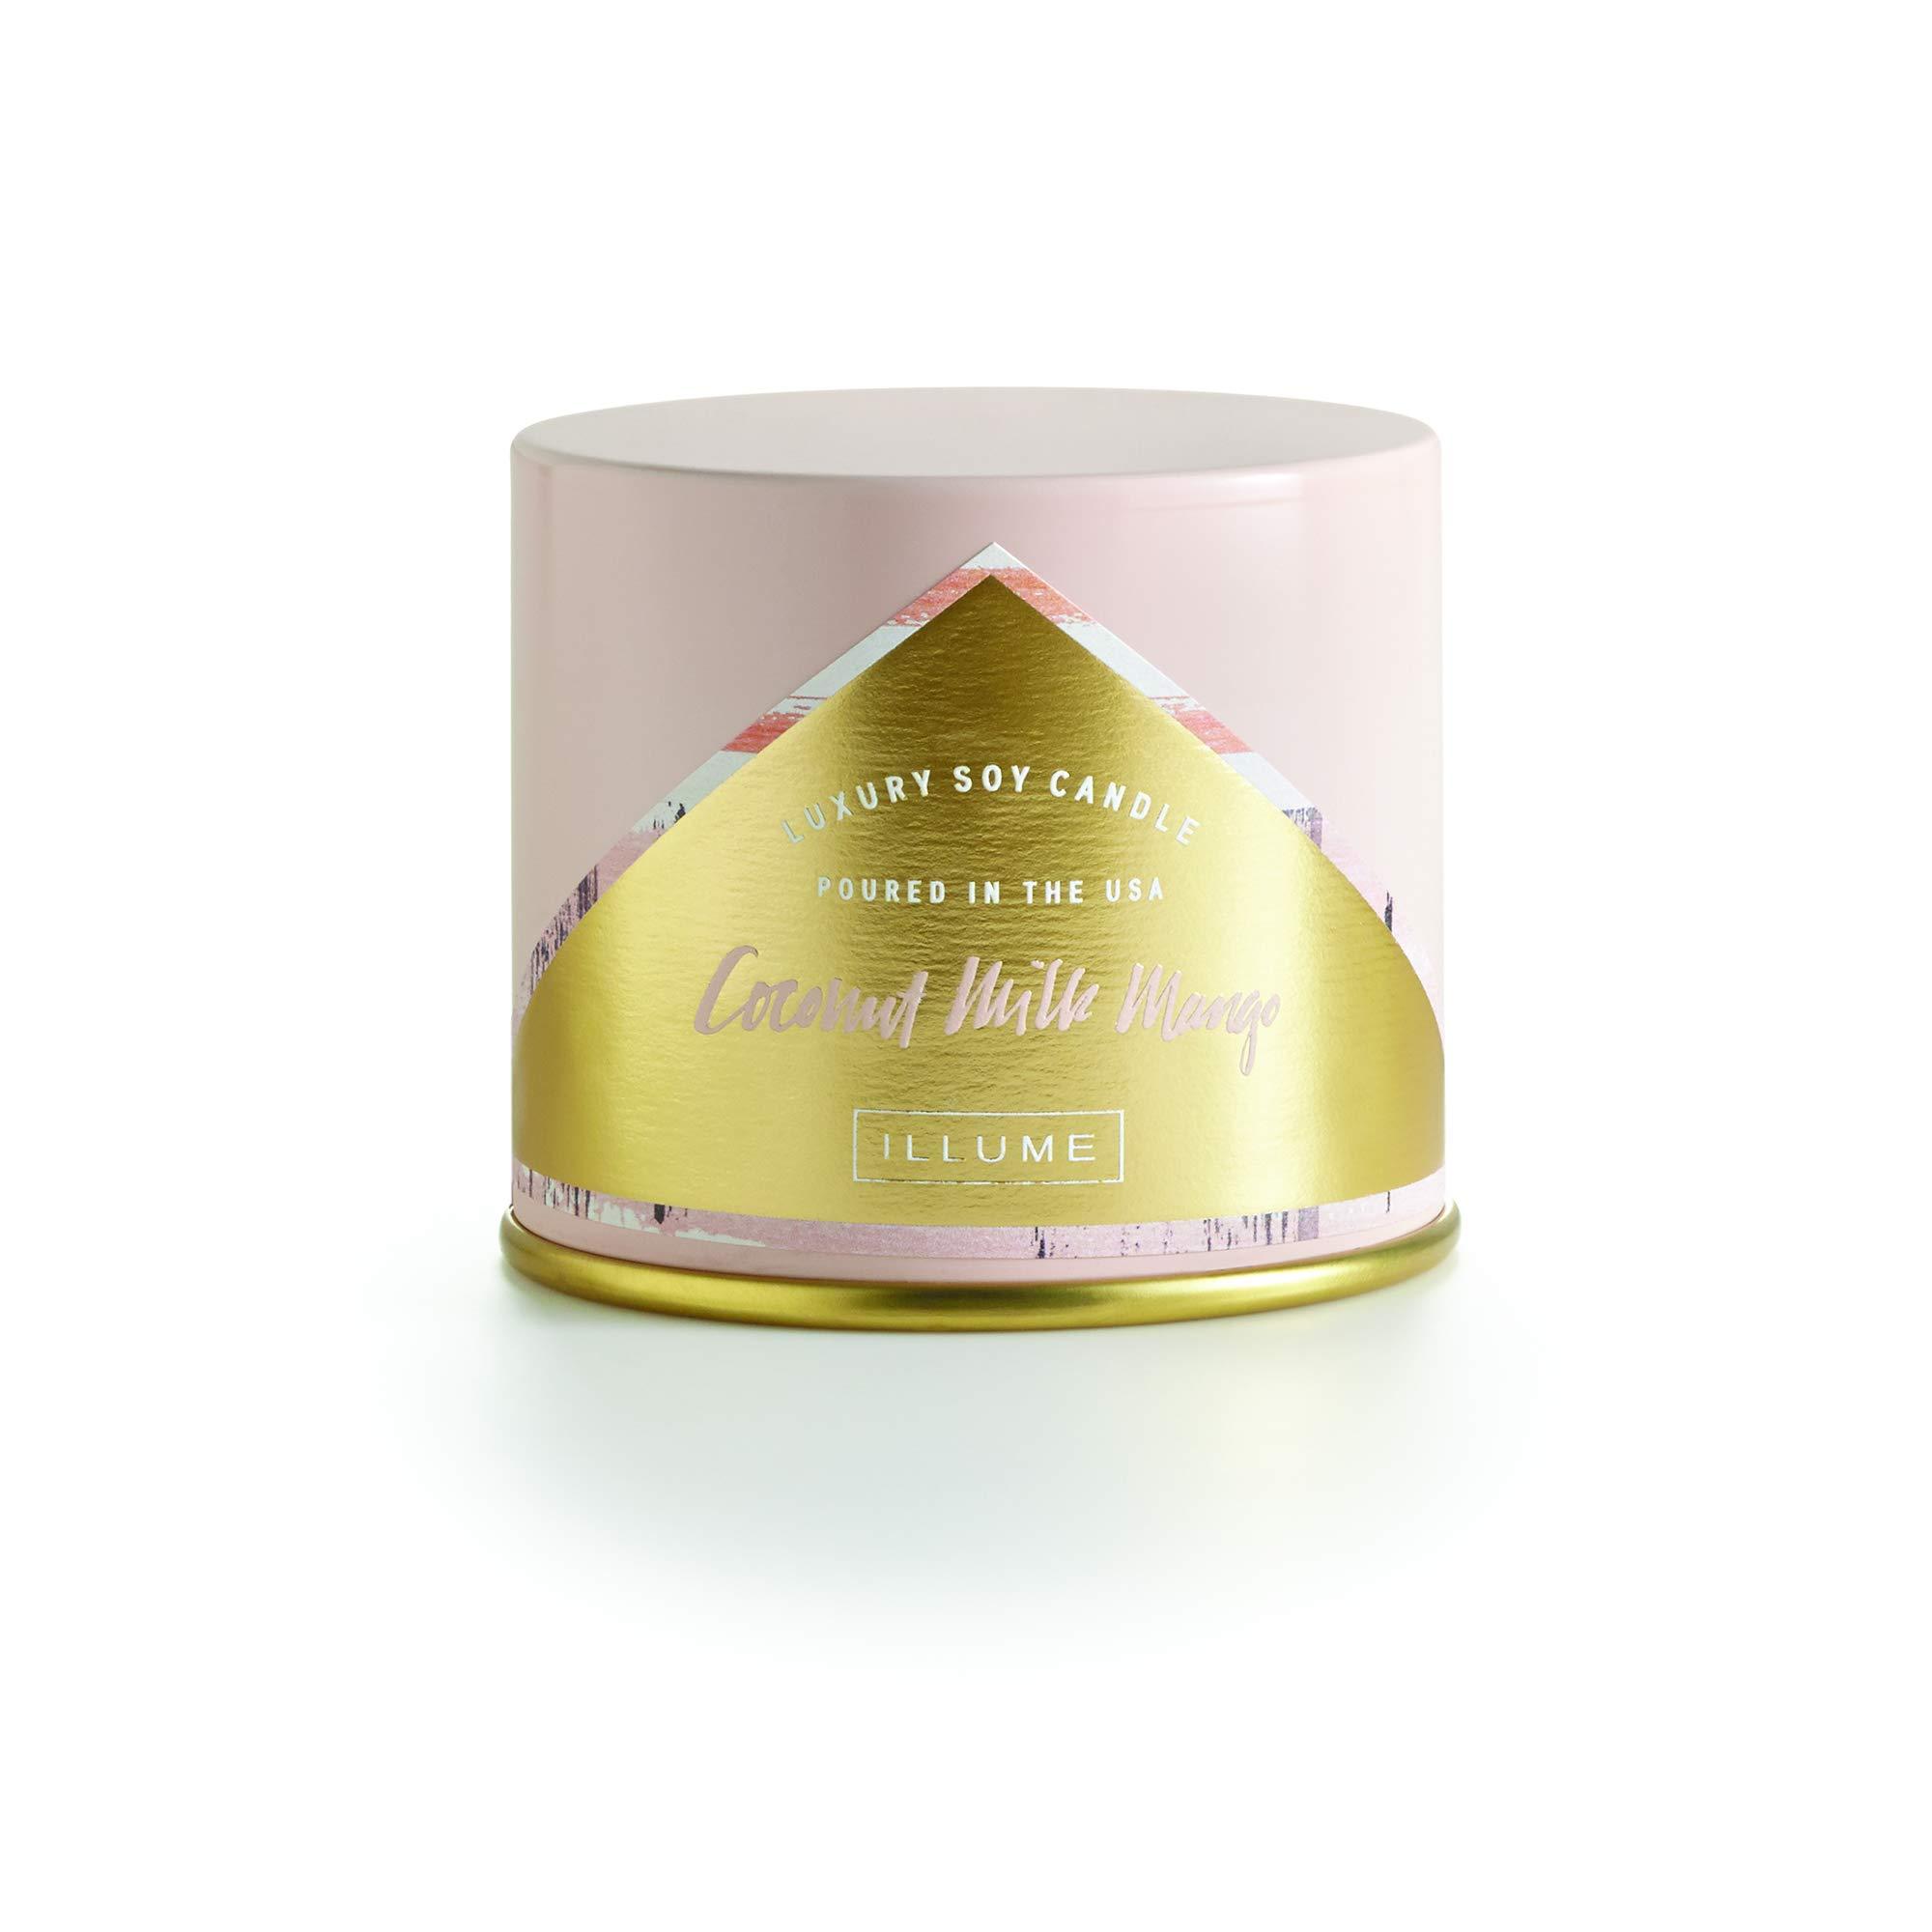 Illume Coconut Milk Mango Vanity Tin, 11.8oz Candle, 11.8 oz, Pink